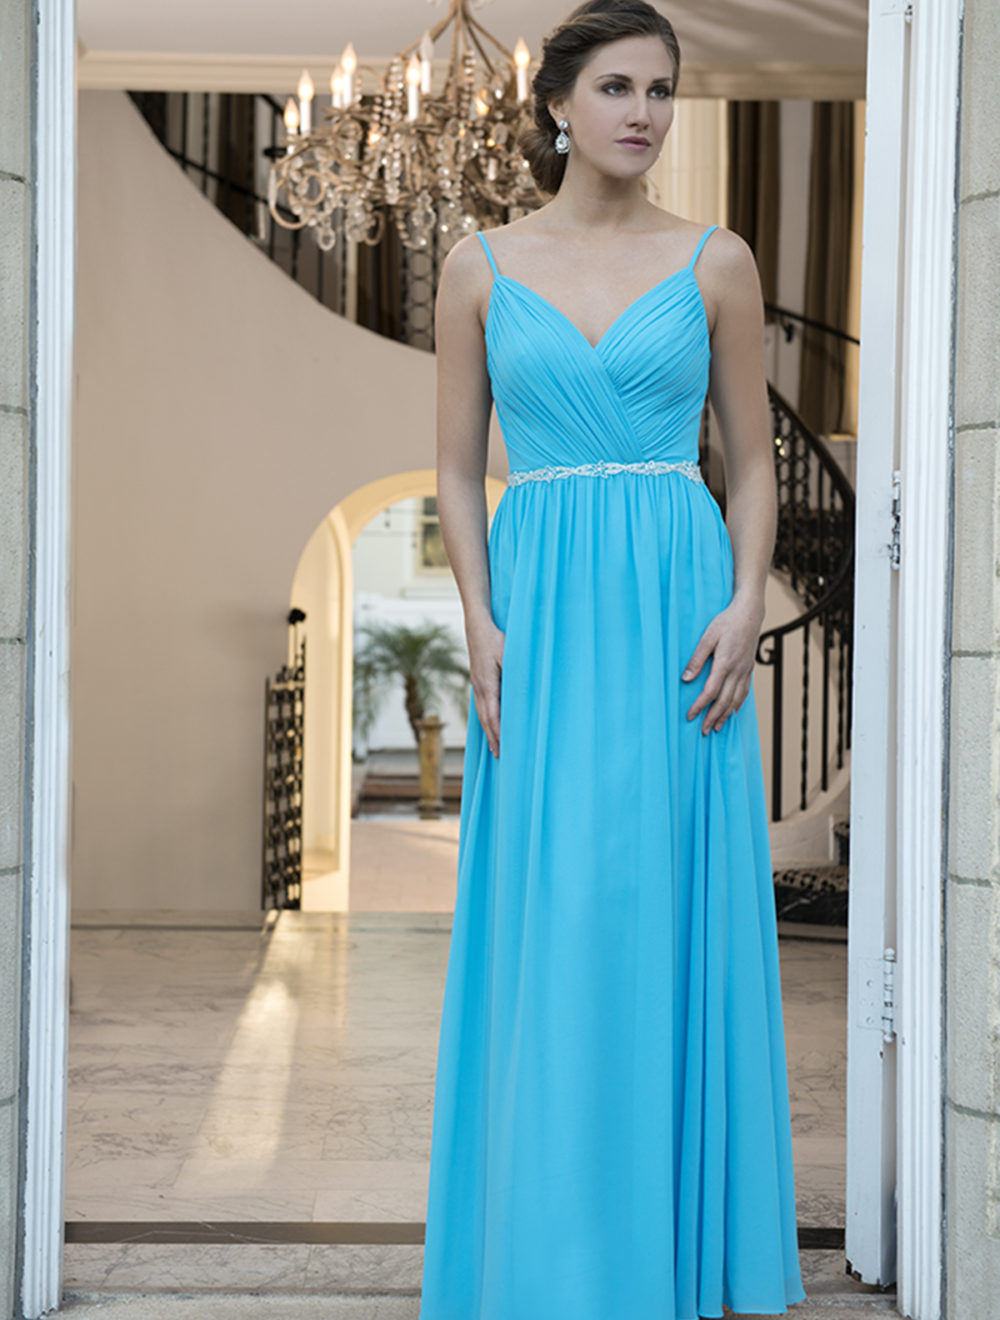 Unique Cheap Bridesmaid Dresses Melbourne Stores Mold - All Wedding ...